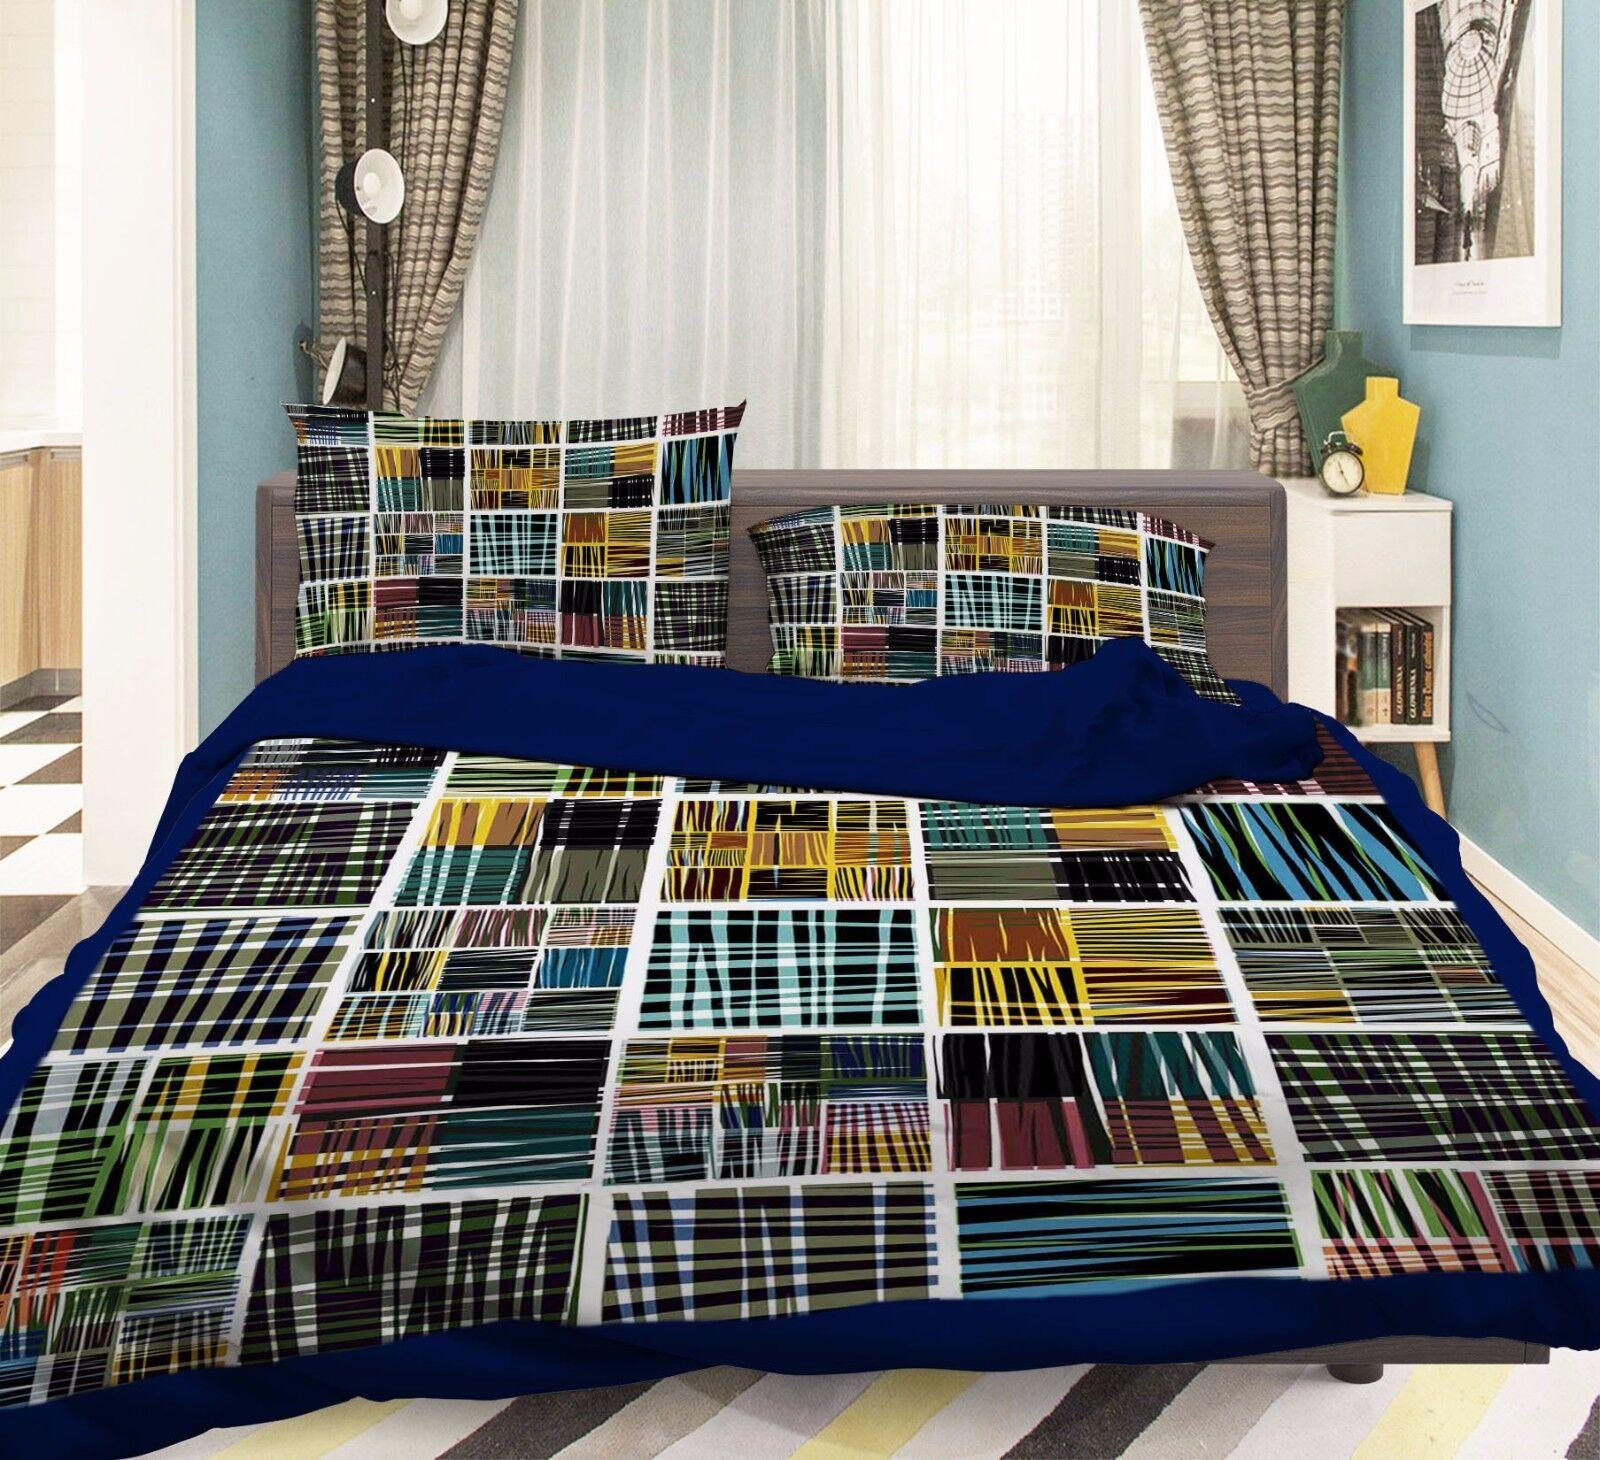 3D Farbe Grid 744 Bed Pillowcases Quilt Duvet Cover Set Single Queen UK Summer